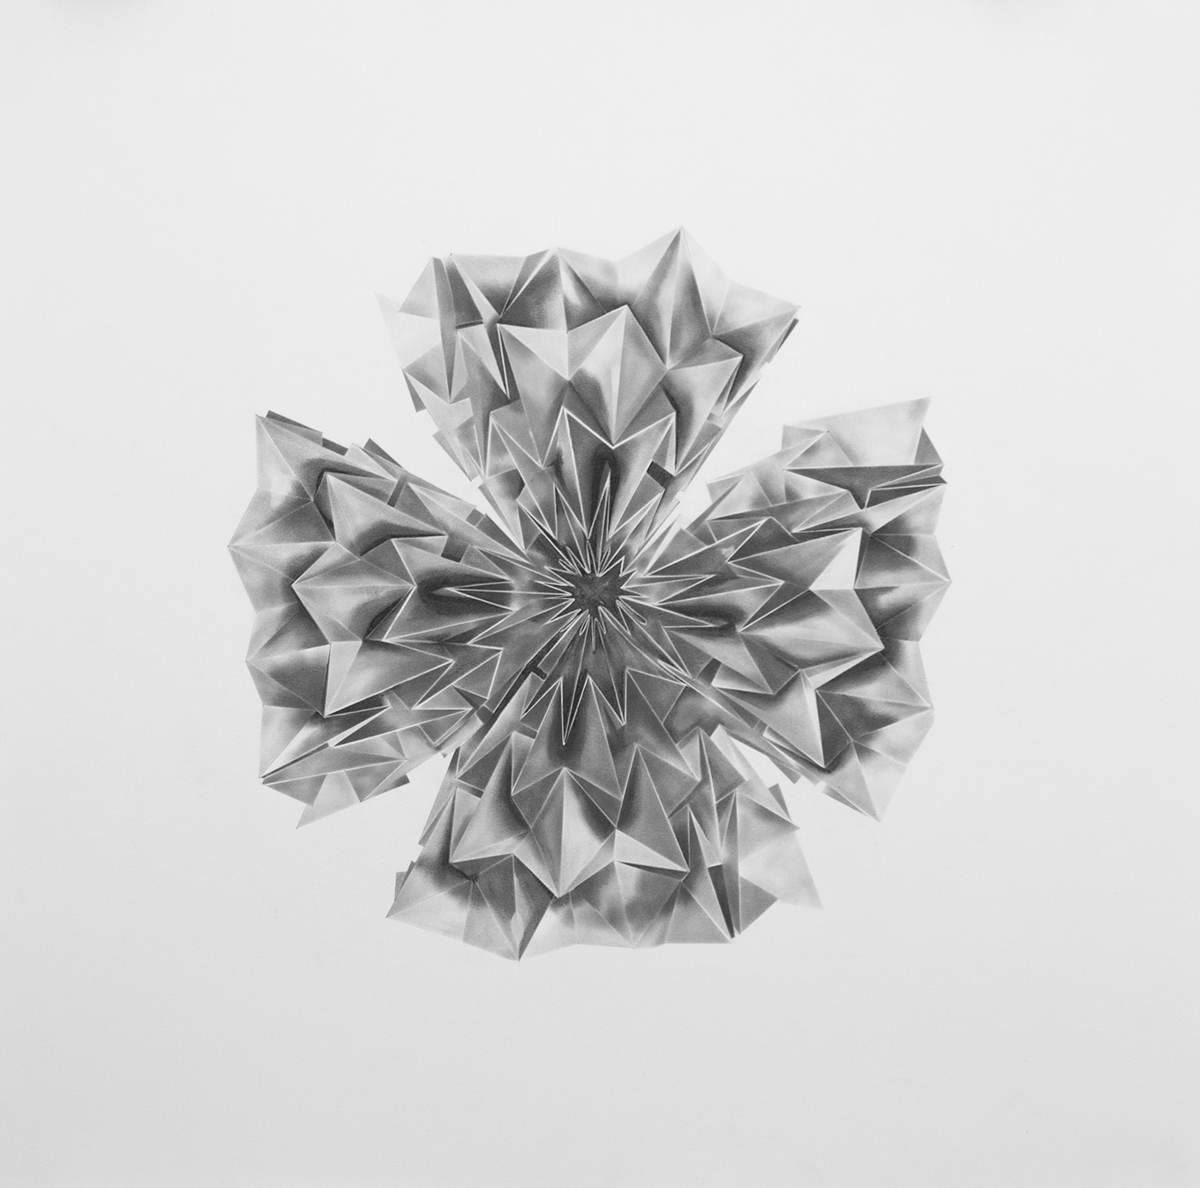 "Philippe Caron Lefebvre,  Ballard's Flora I,   2015, graphite on paper, 30"" x 30"" (76 x 76 cm)"